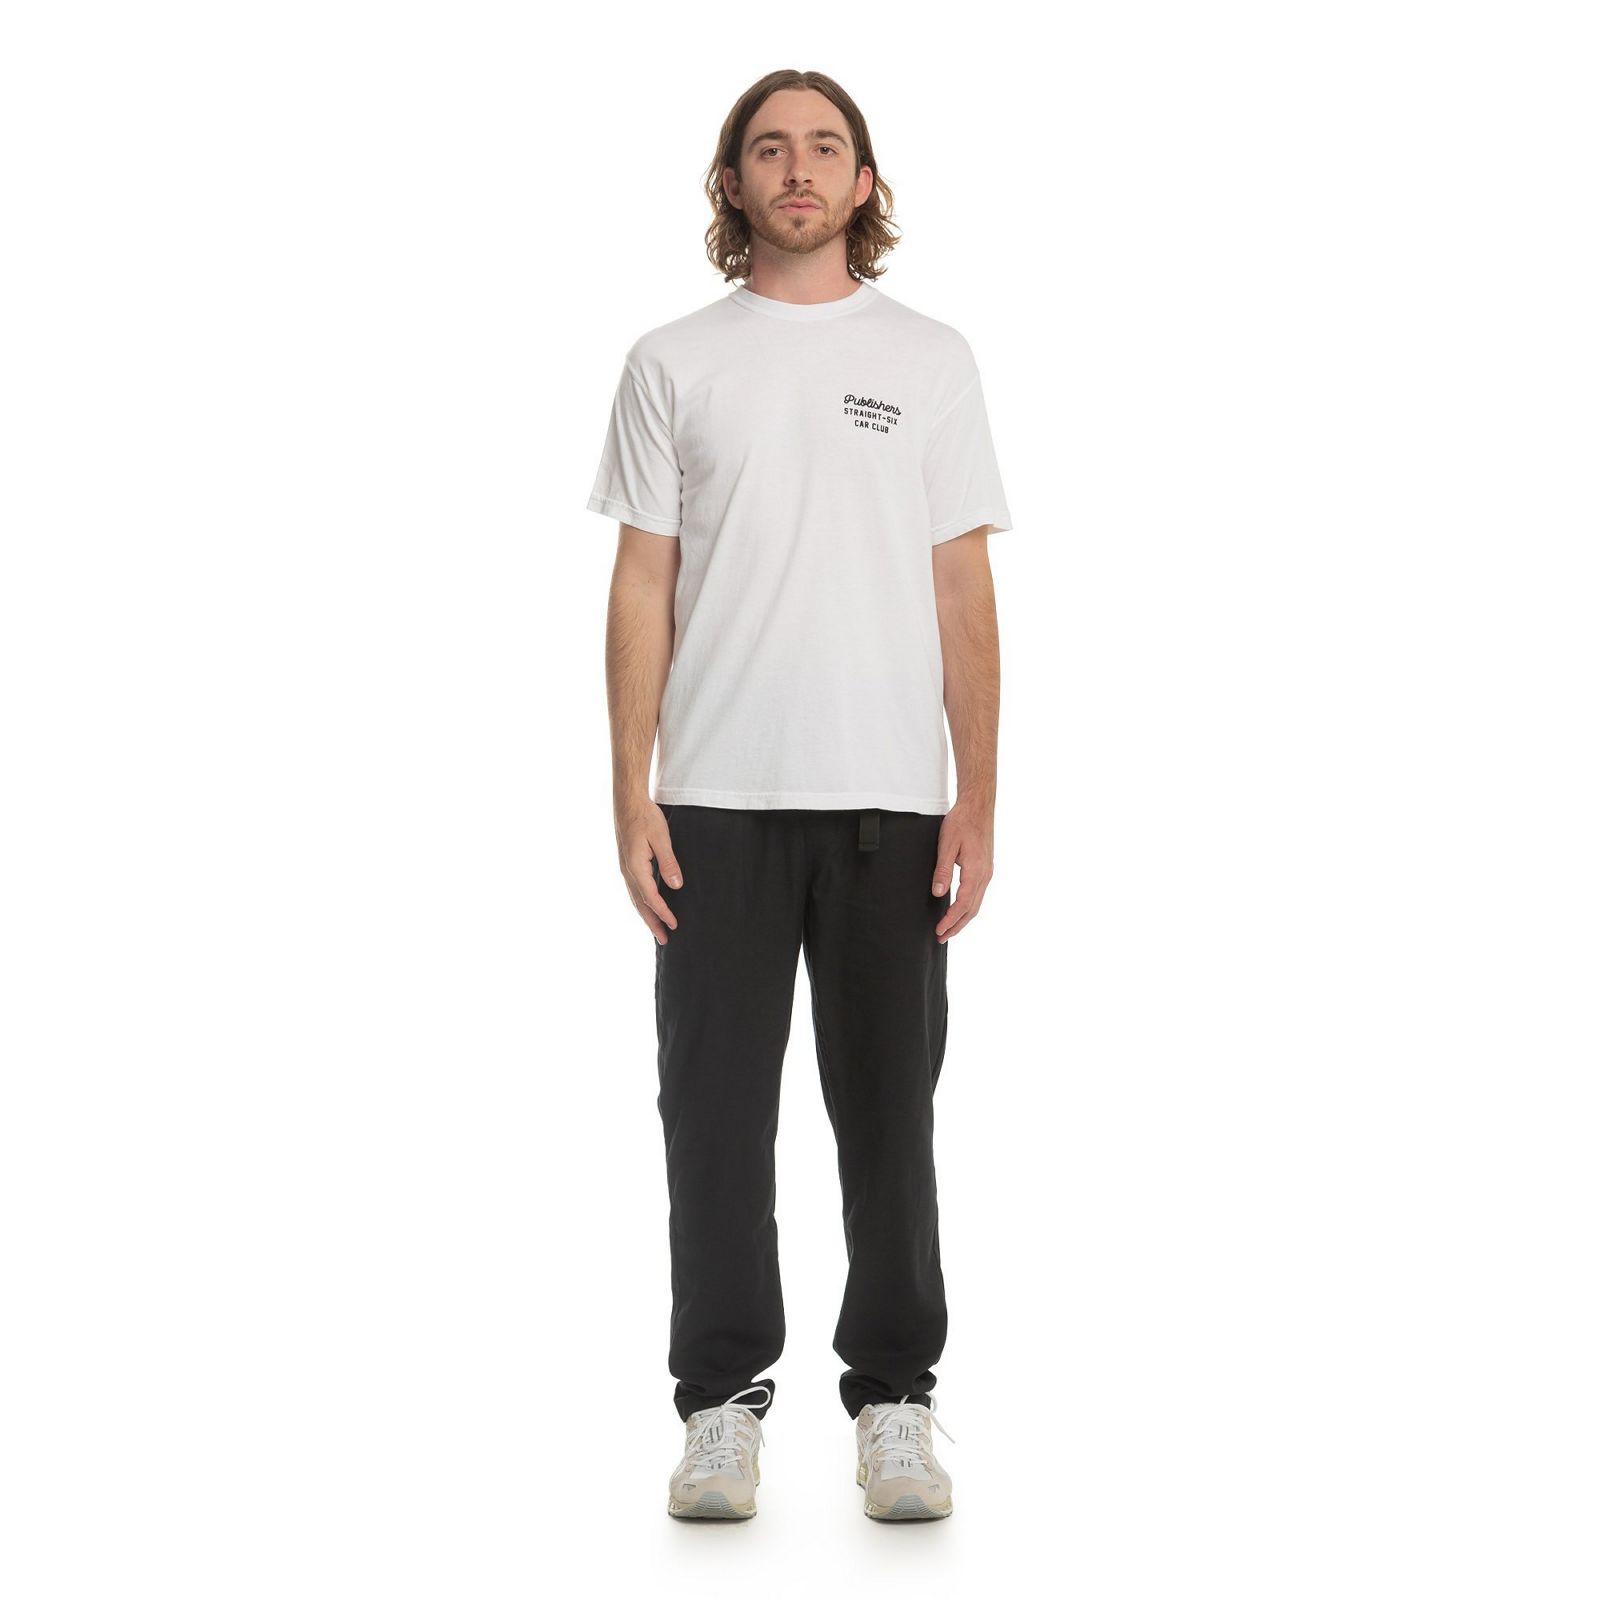 【PUBLISH BRAND/パブリッシュブランド】CAR CLUB Tシャツ / WHITE